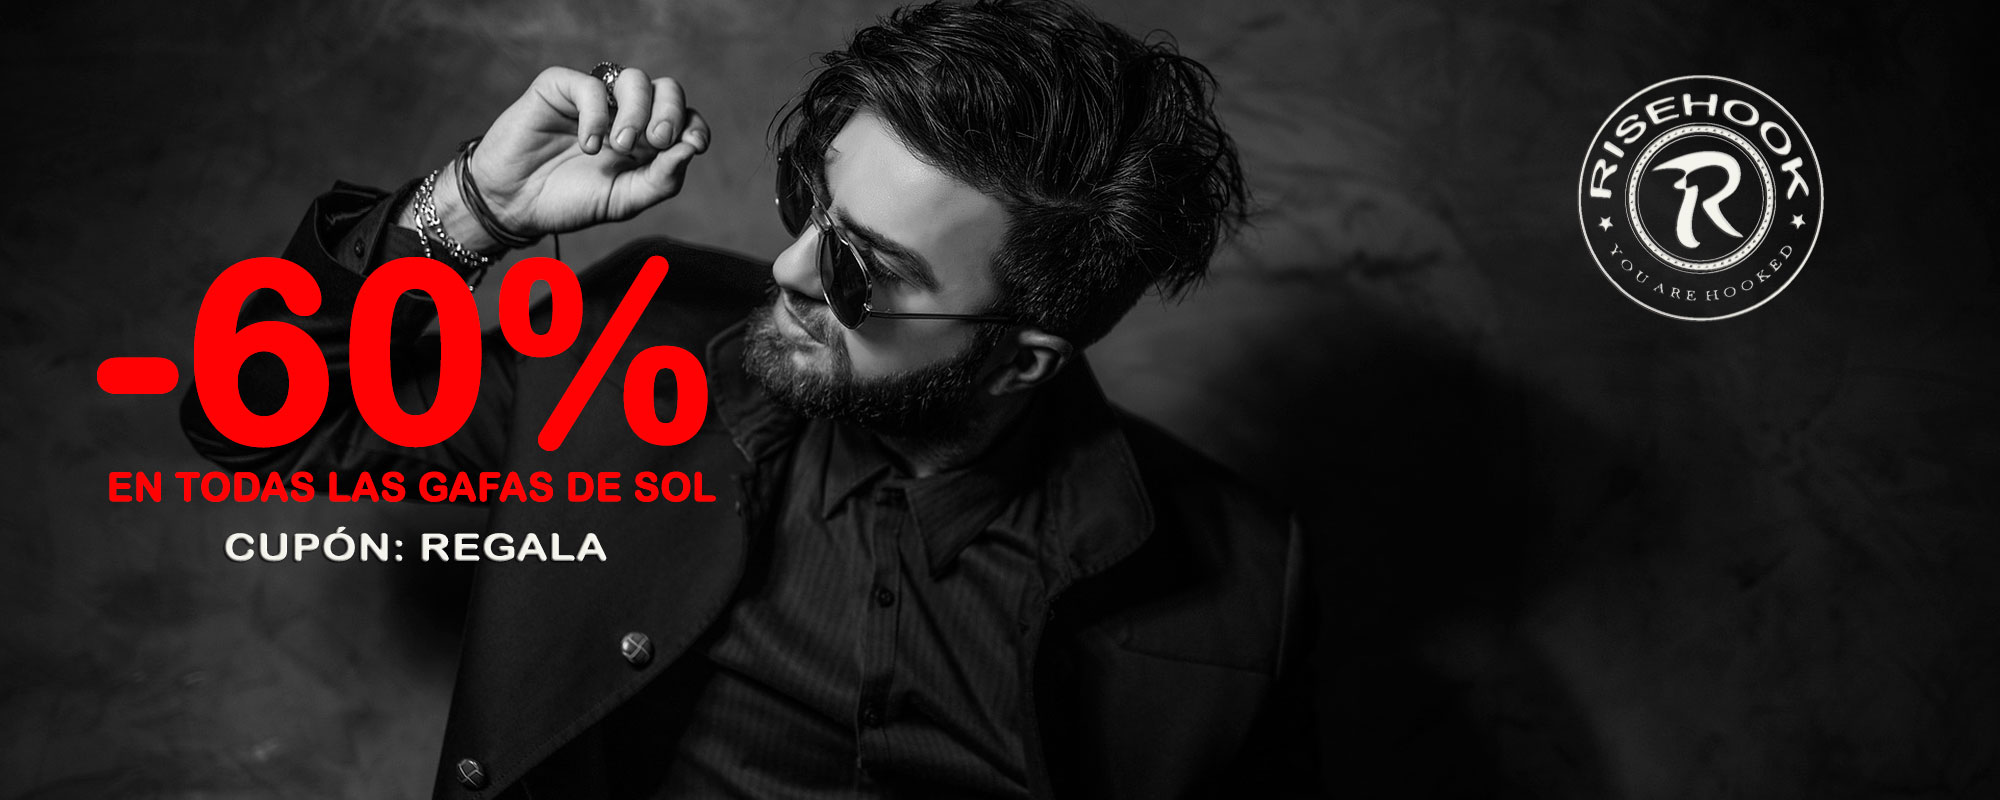 Gafas-de-sol-polarizadas-60%-descuento